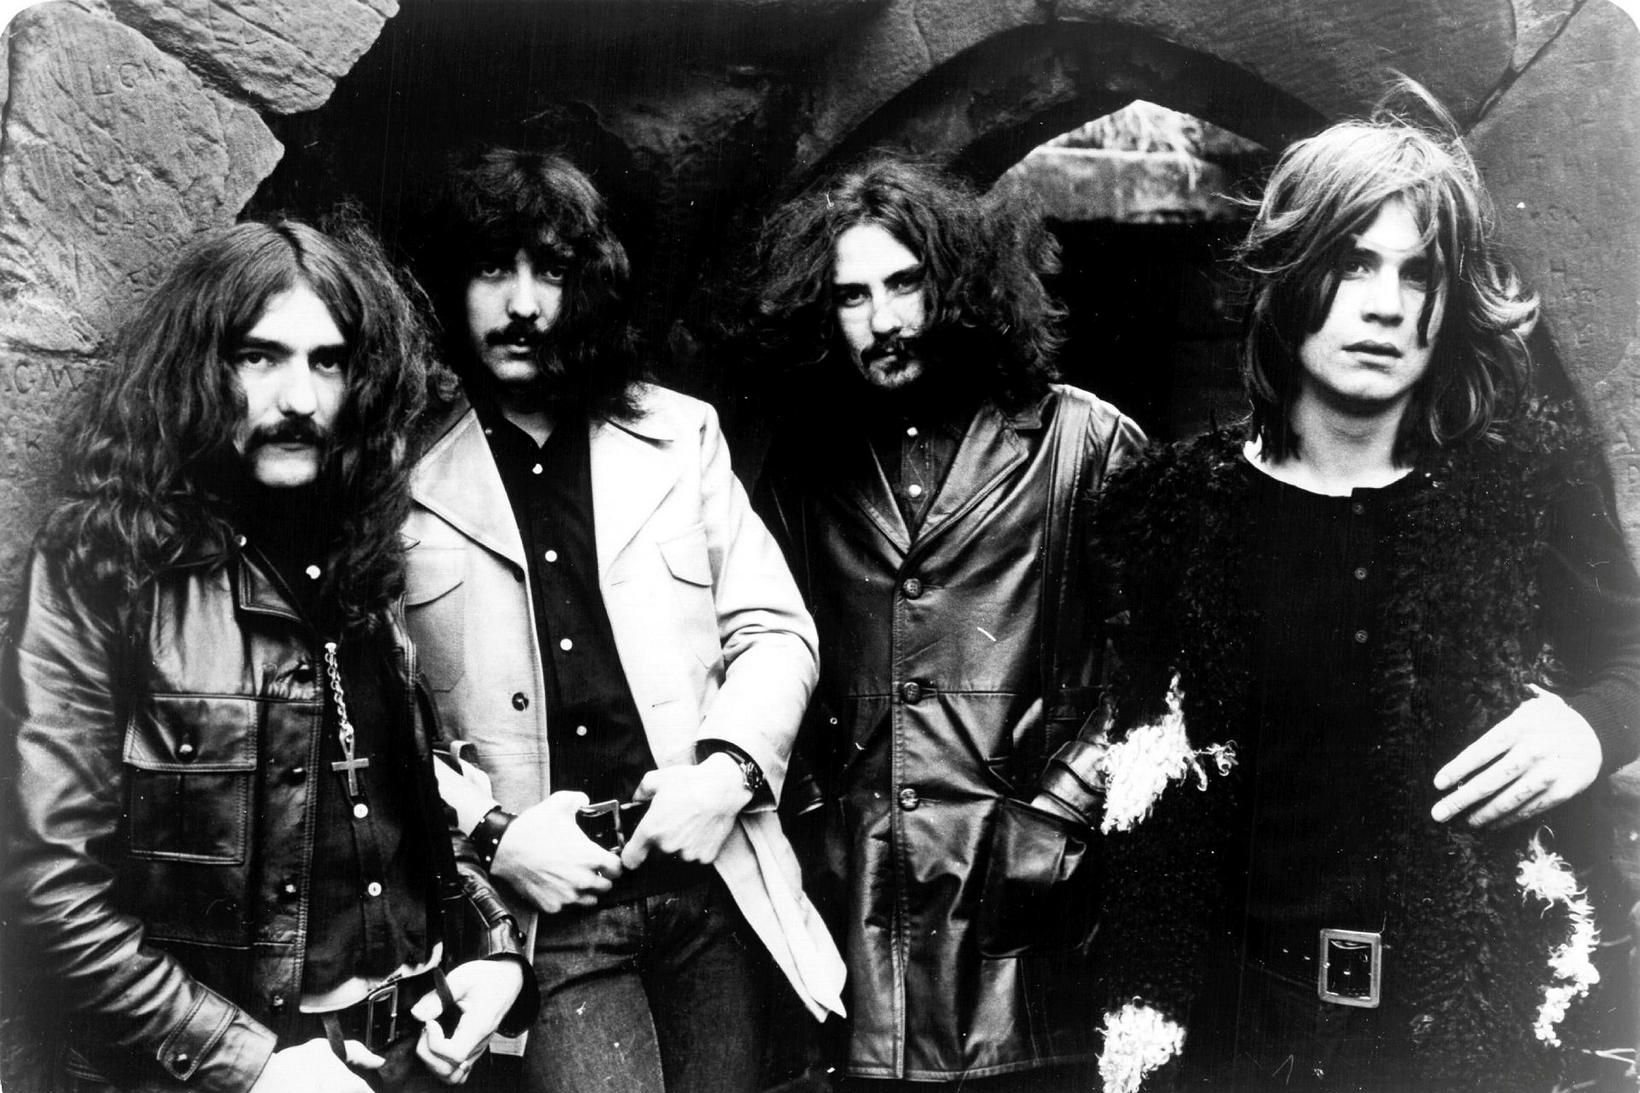 Black Sabbath við upphaf ferils síns; Geezer Butler er lengst …